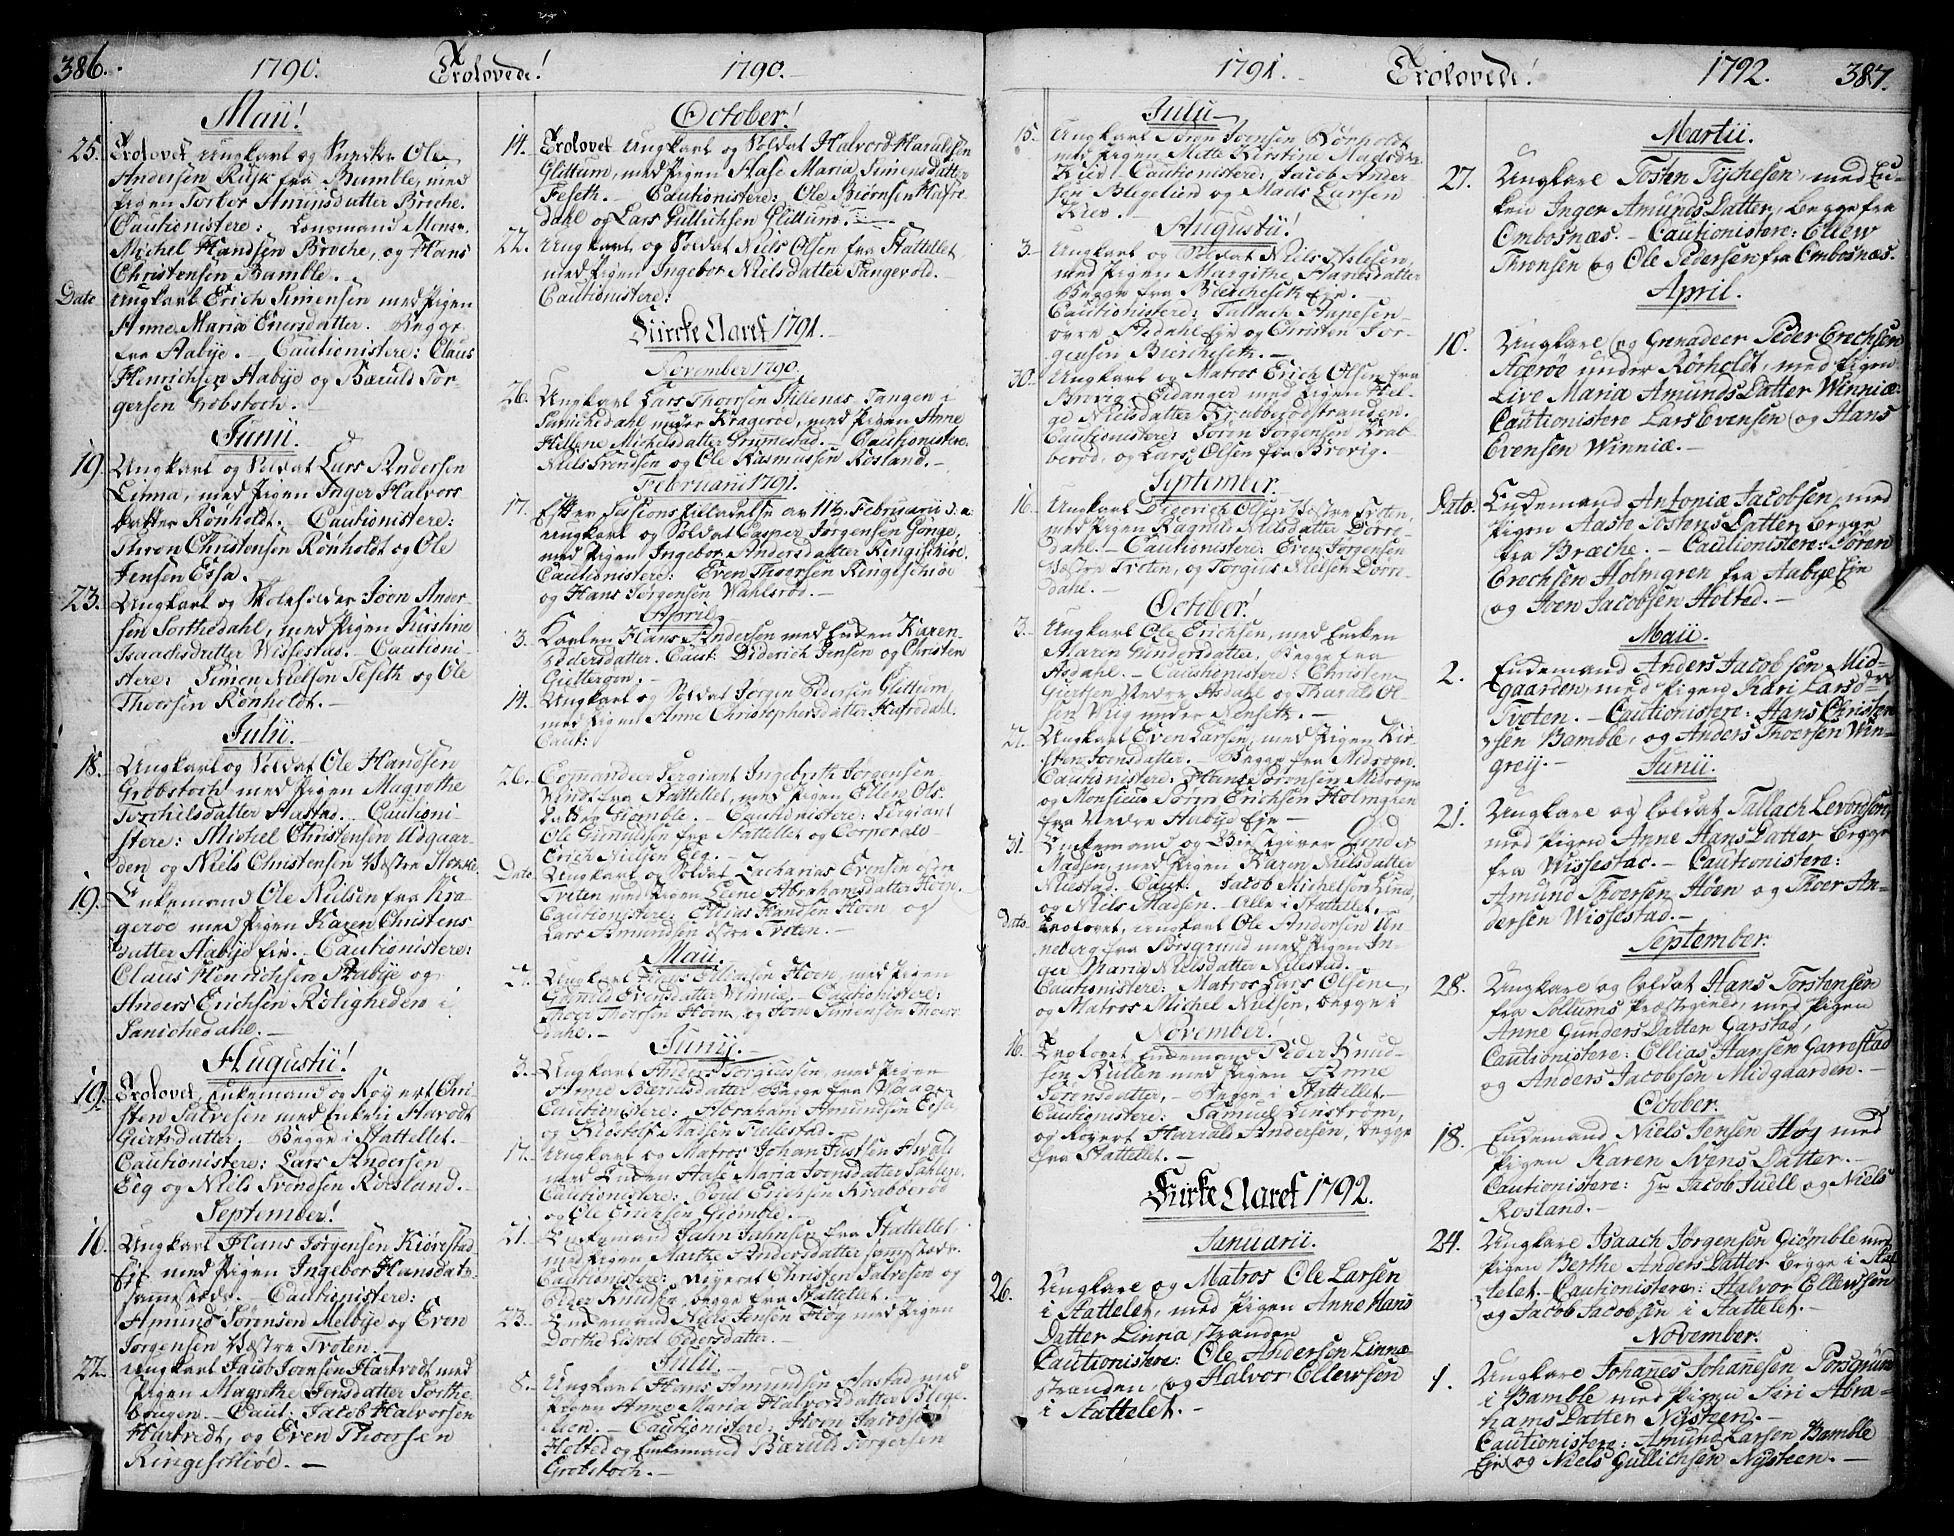 SAKO, Bamble kirkebøker, F/Fa/L0002: Ministerialbok nr. I 2, 1775-1814, s. 386-387